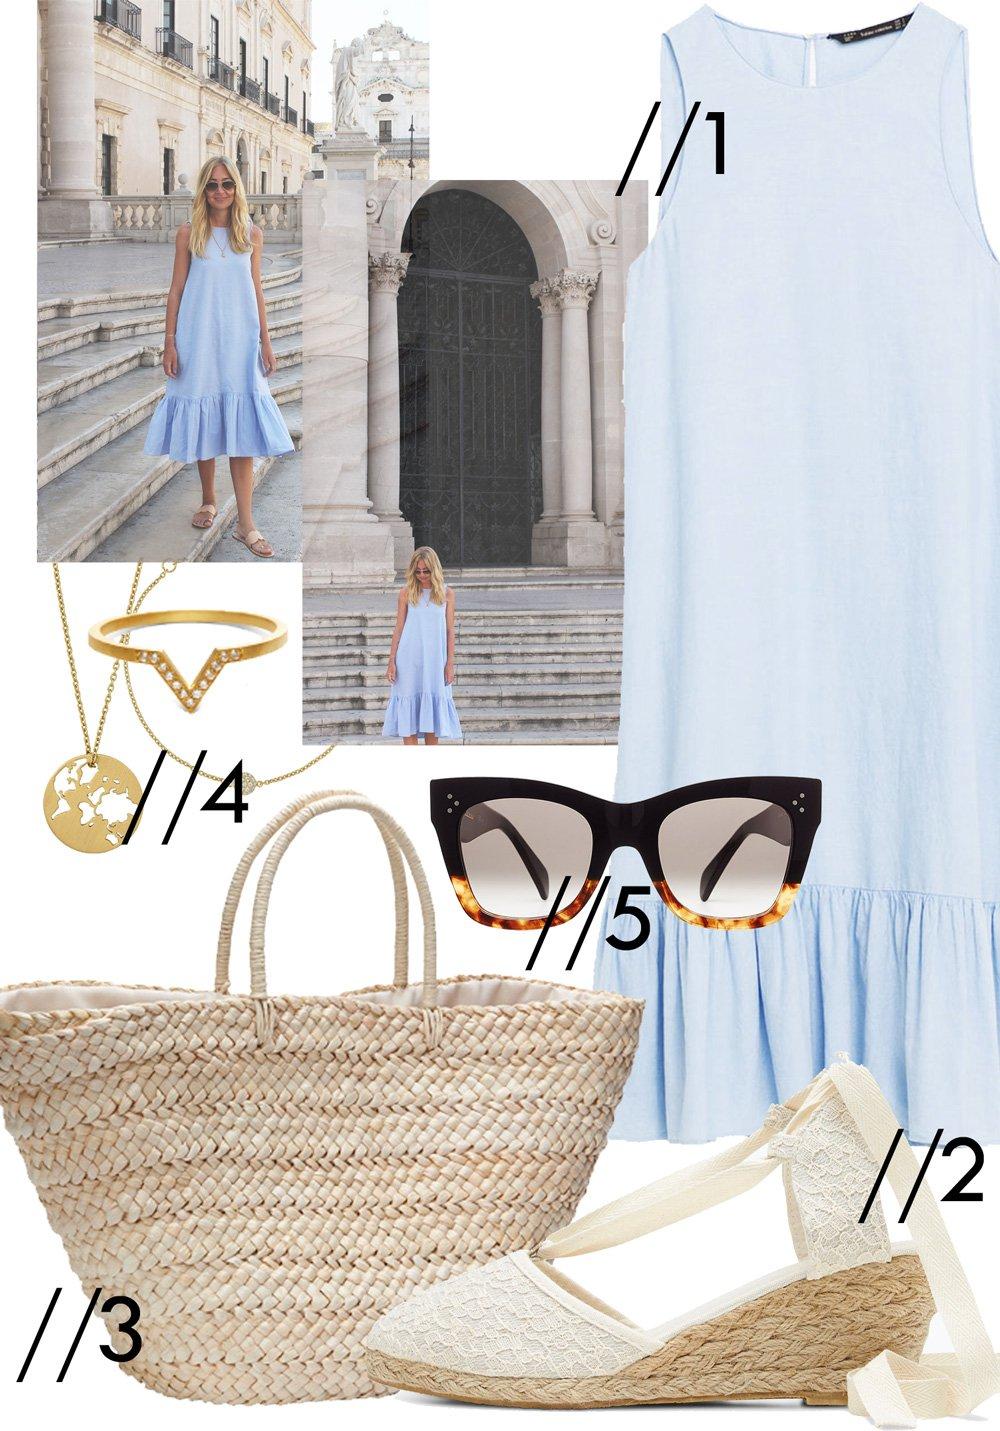 wedding-vacation-wishlist-ellos-espadriller-zara-kjole-stra?taske